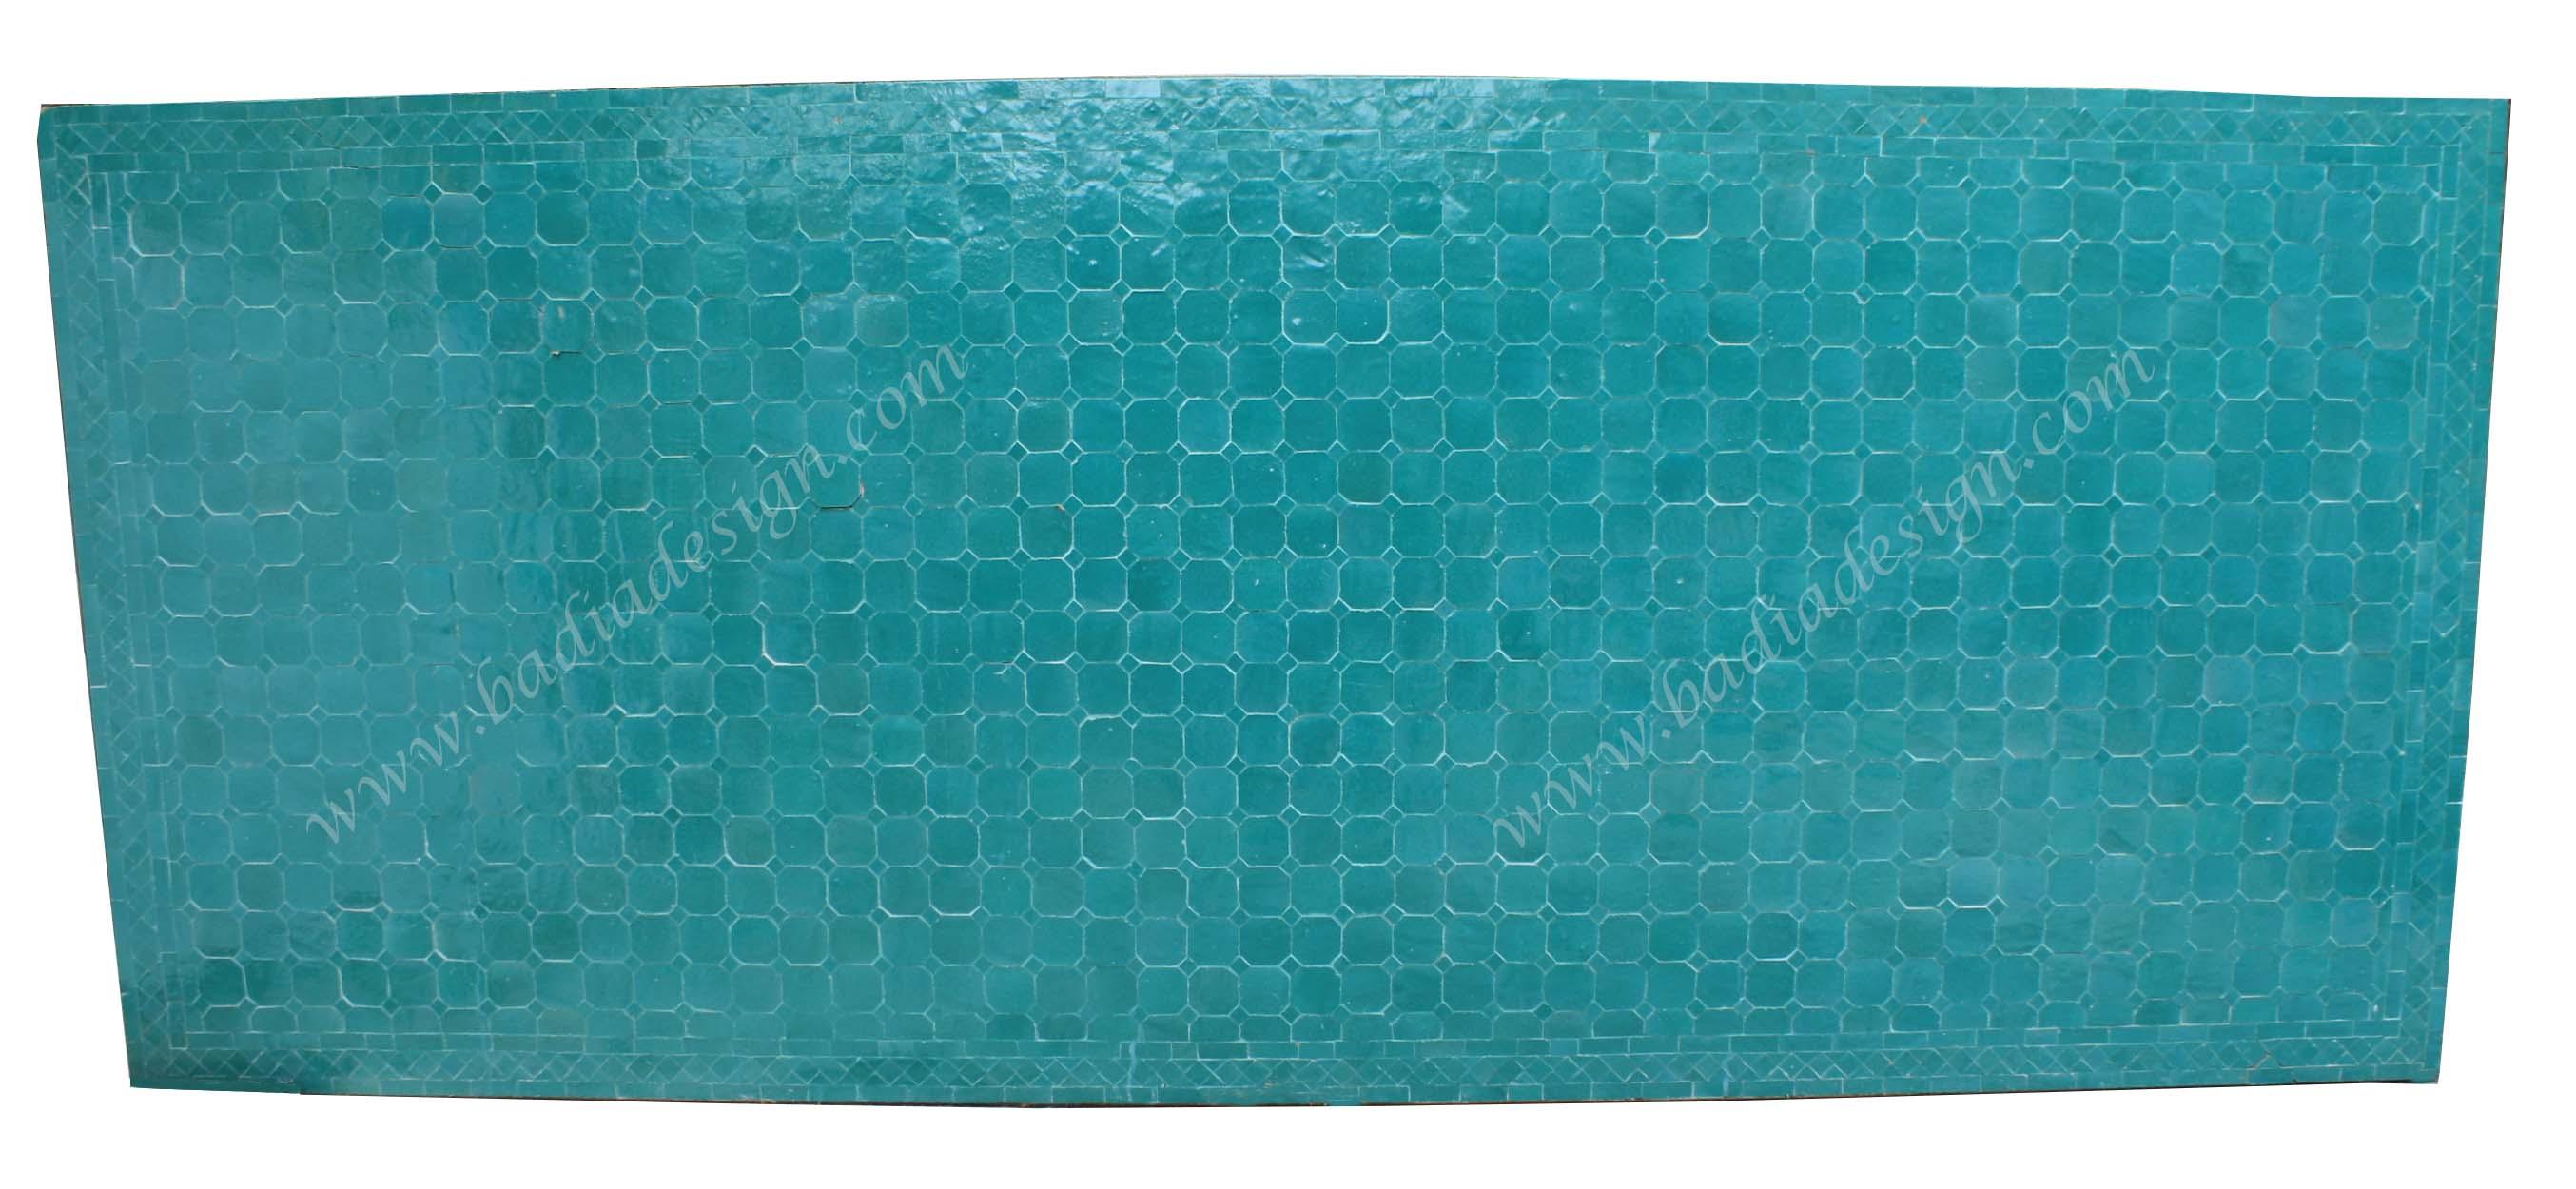 large-95-x-40-rectangular-tile-table-top-mt752.jpg